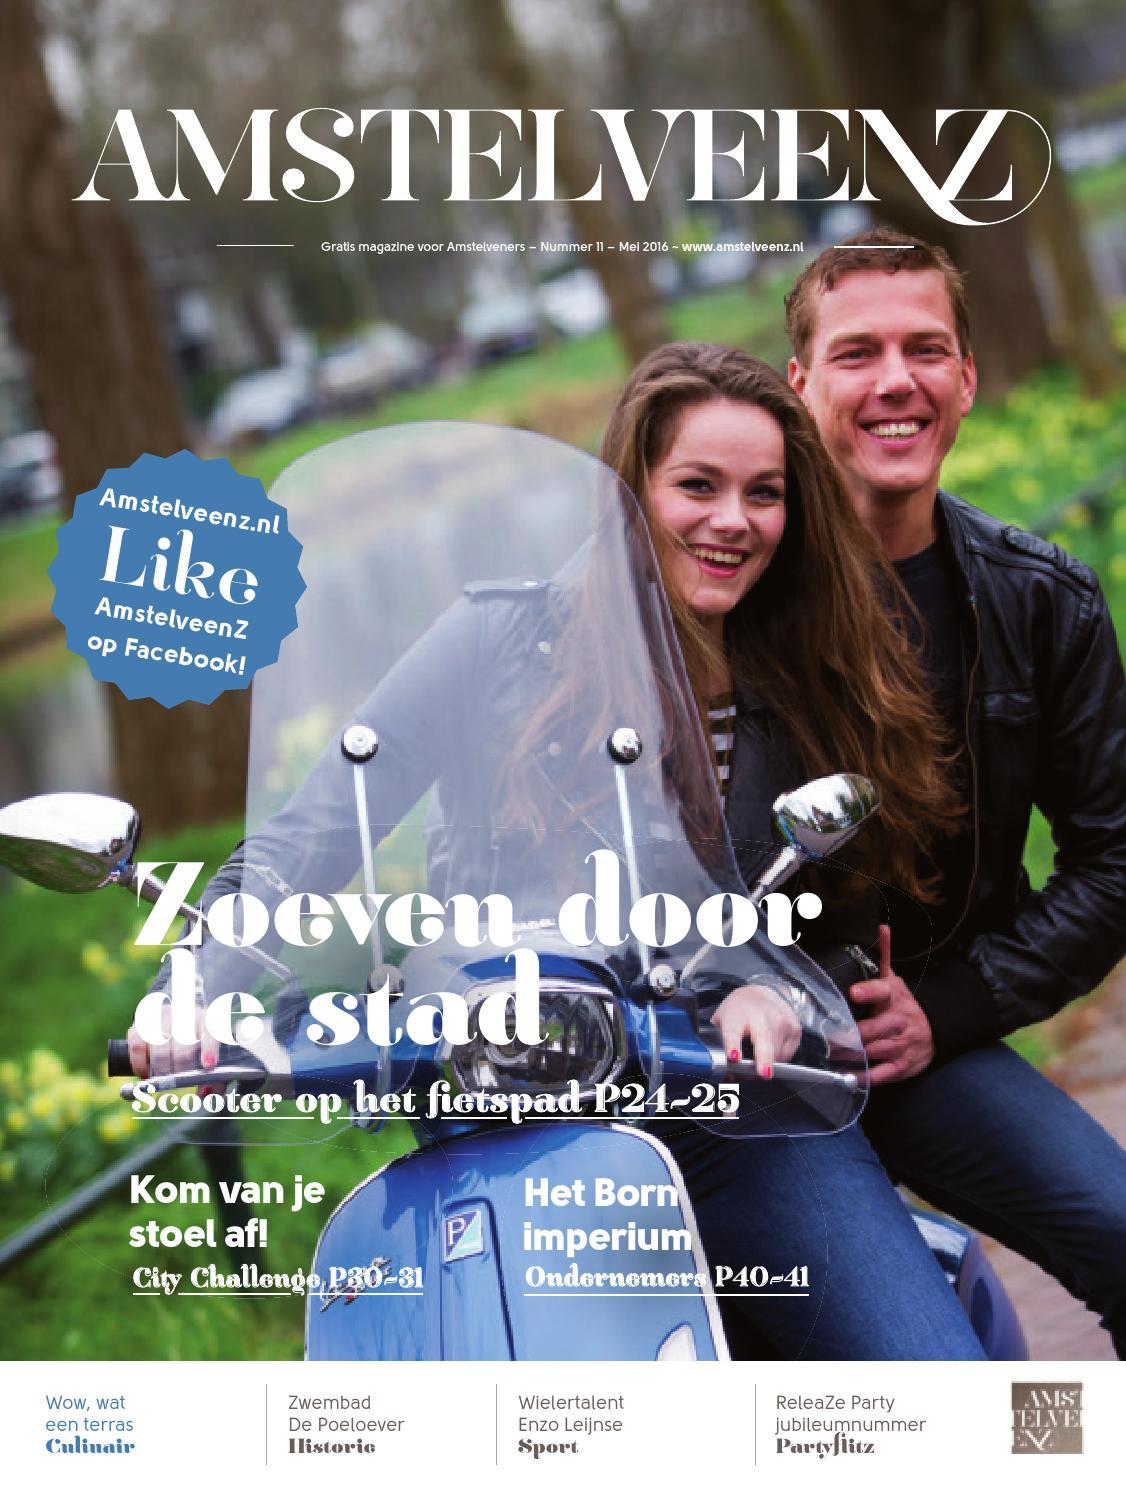 Amstelveenz magazine mei 2016 nr 11 by Amstelveenz.nl - issuu